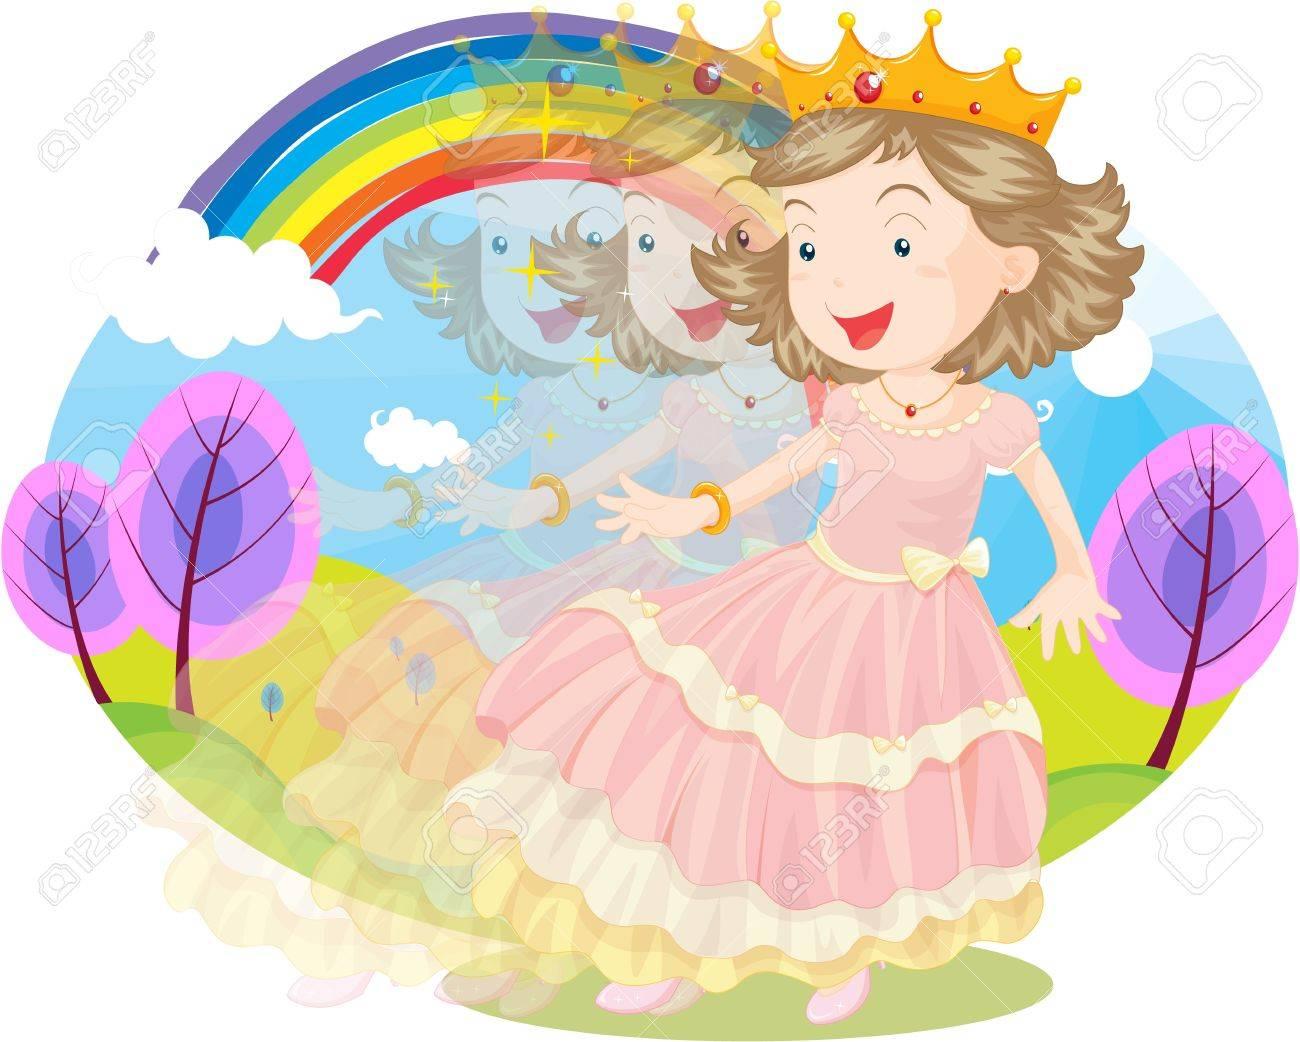 Princess in her natural kingdom Stock Vector - 13190201